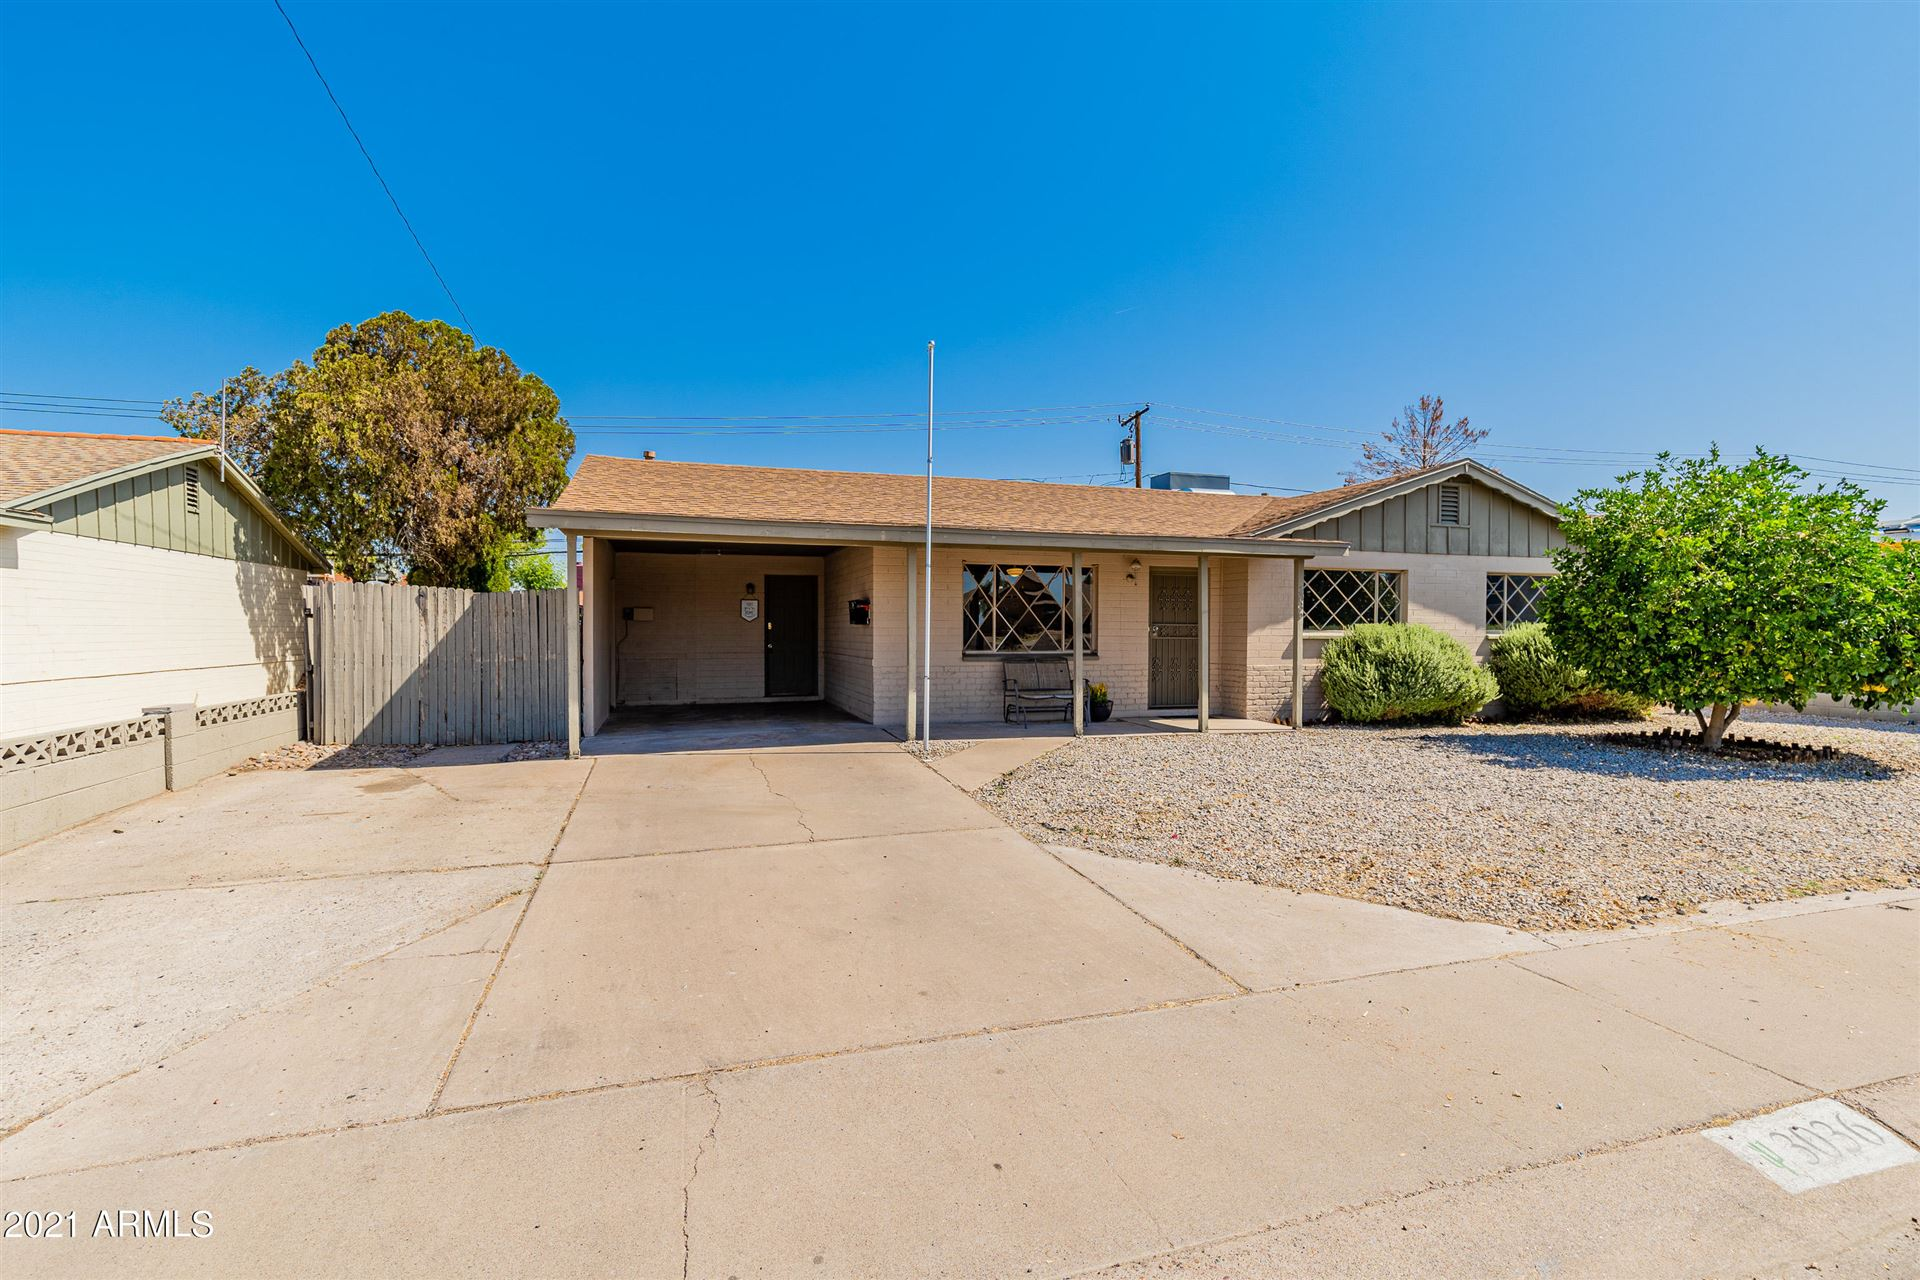 3036 W CACTUS Road, Phoenix, AZ 85029 - MLS#: 6236354